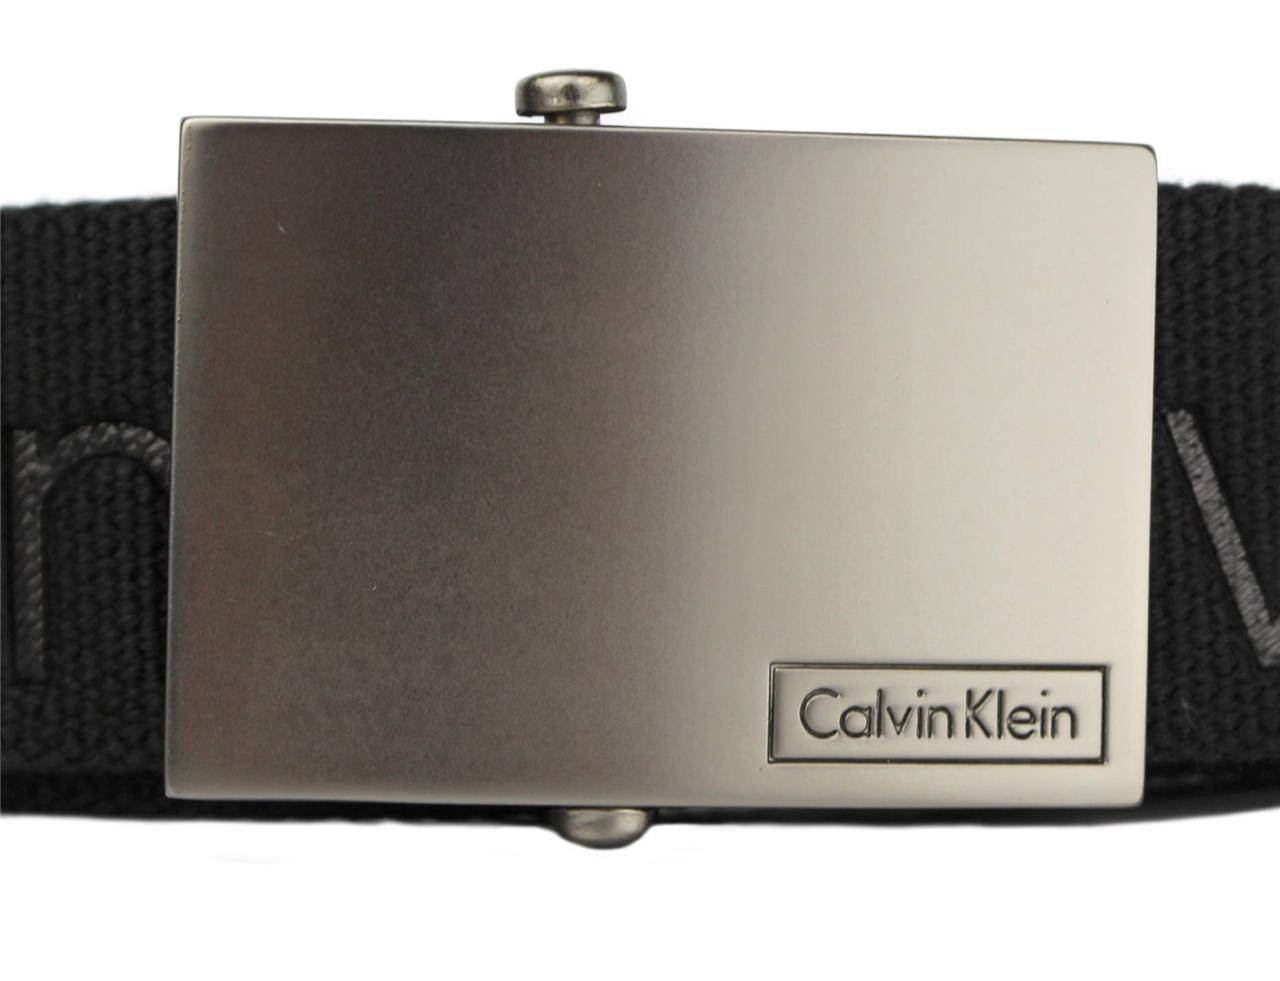 New-Calvin-Klein-Men-039-s-Premium-CK-Logo-Cotton-Adjustable-38mm-Canvas-Belt-73545 thumbnail 3